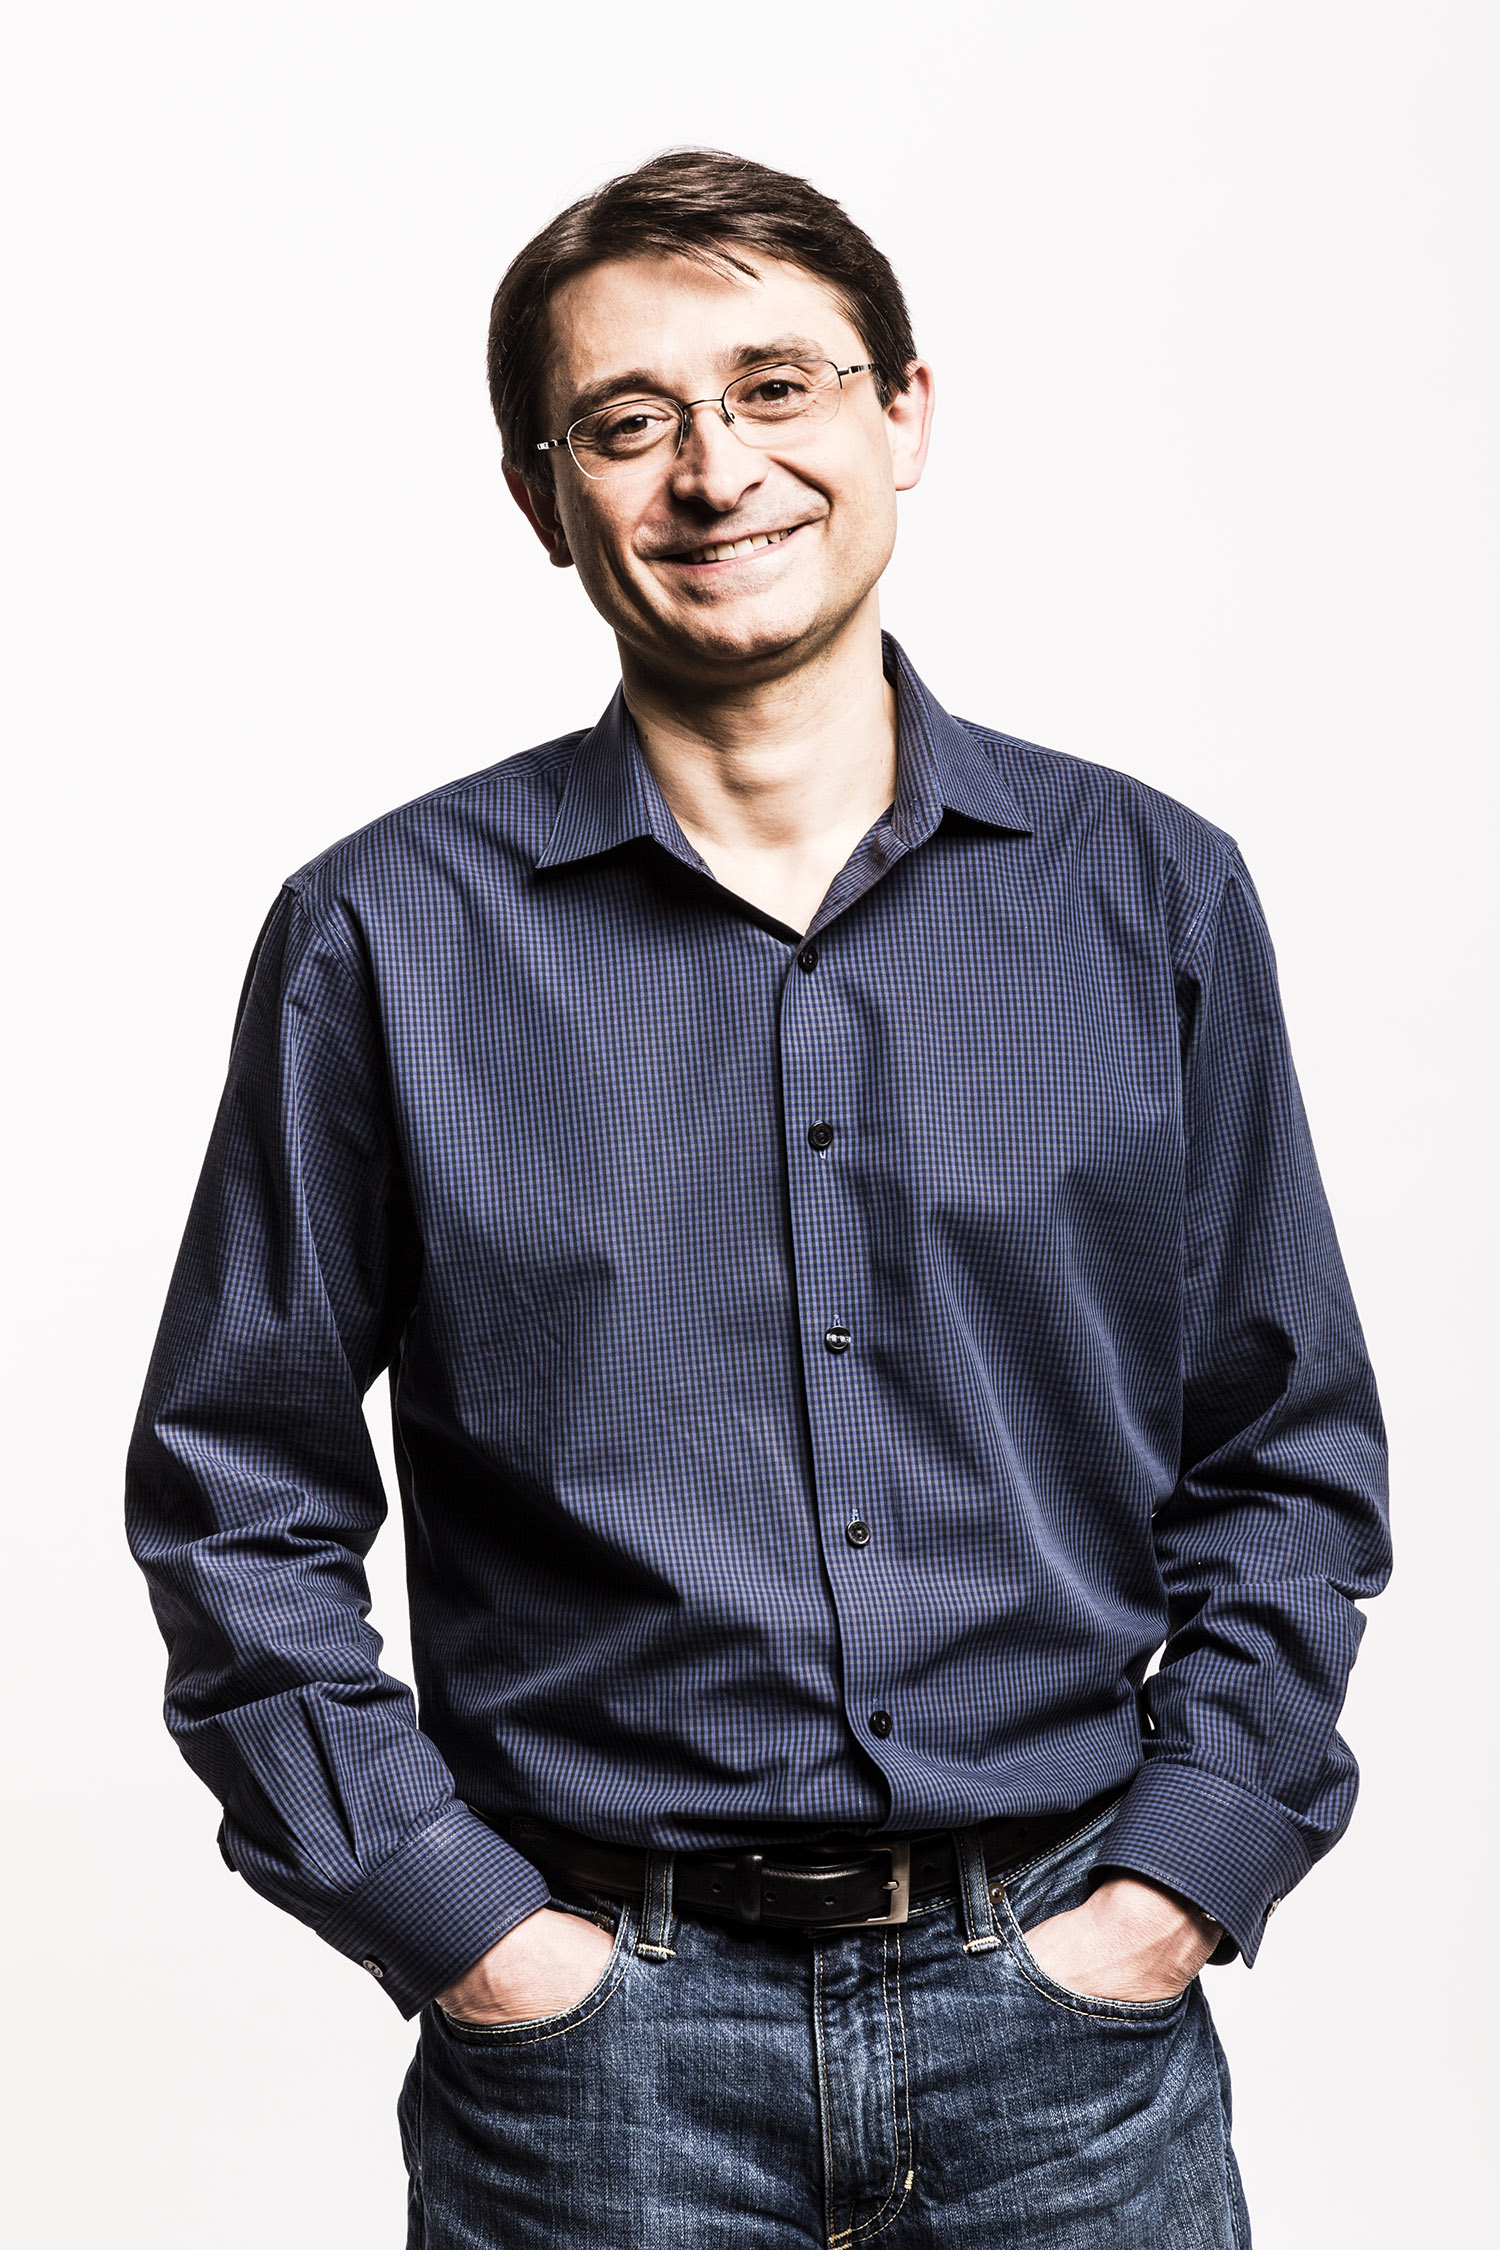 Jordi Ribas